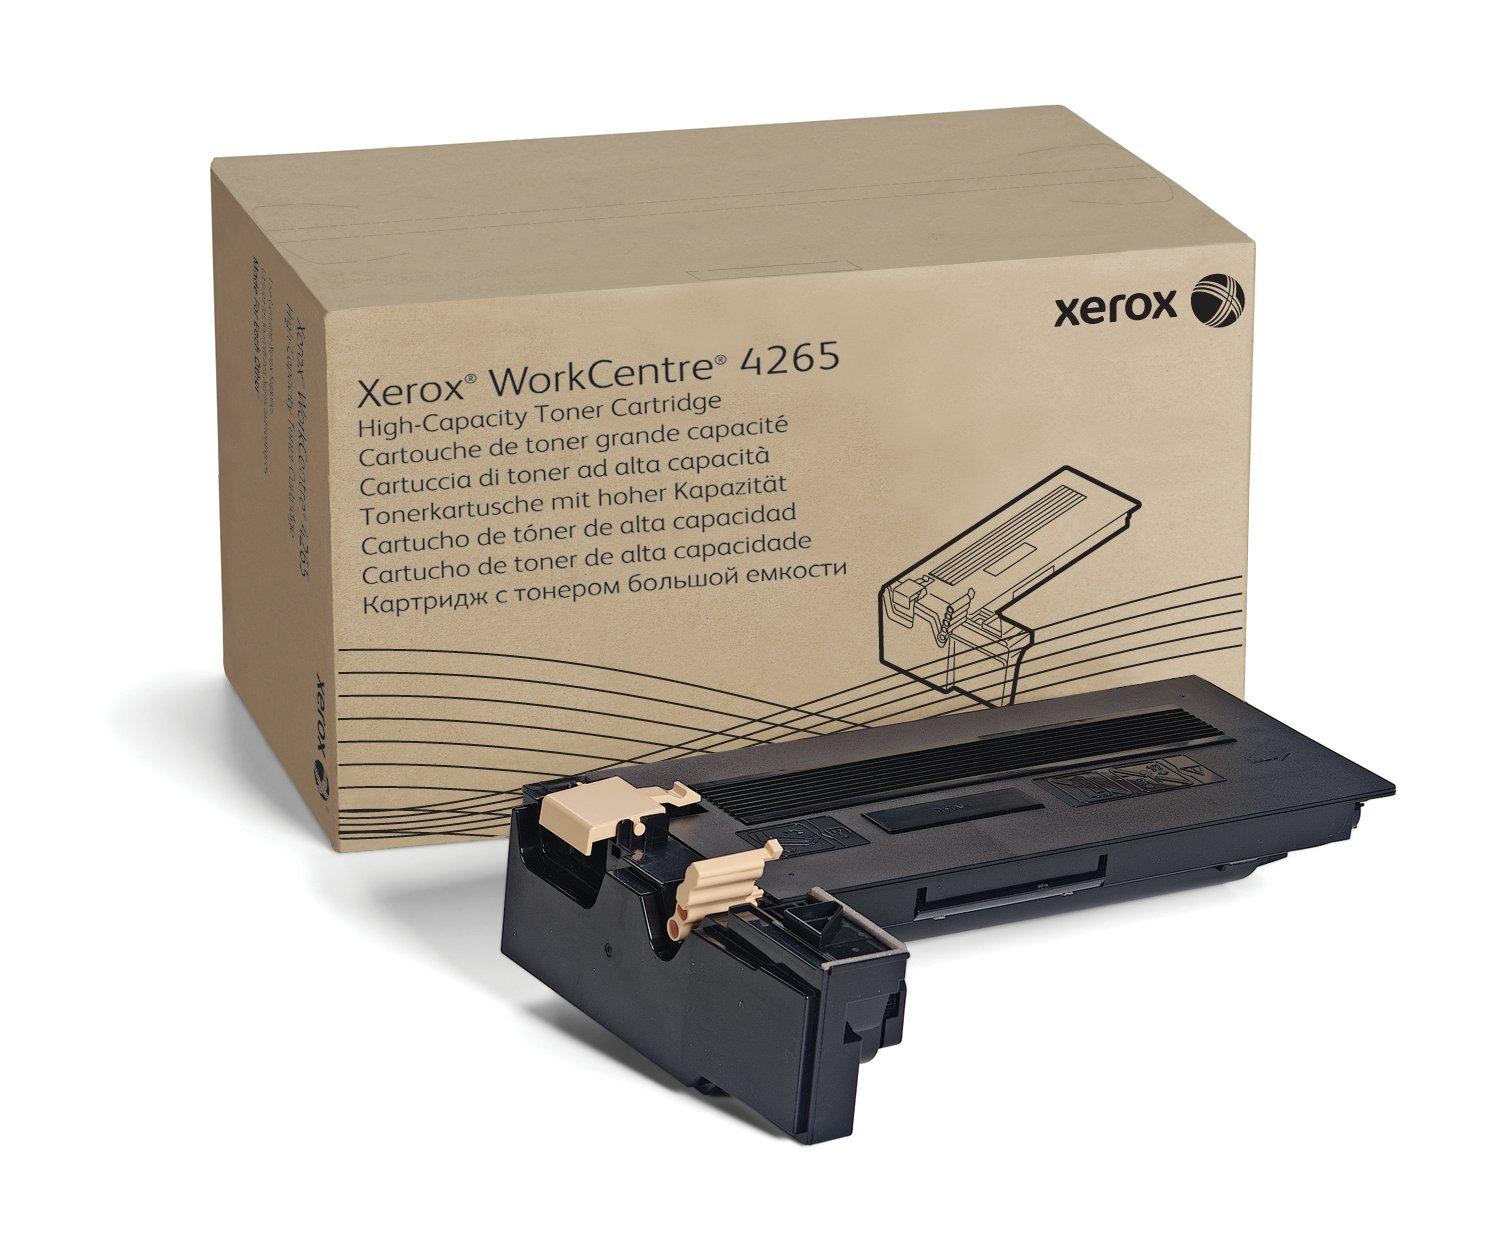 Toner Original XEROX Alta Capacidad Black para the WorkCentre 4265 106R02734